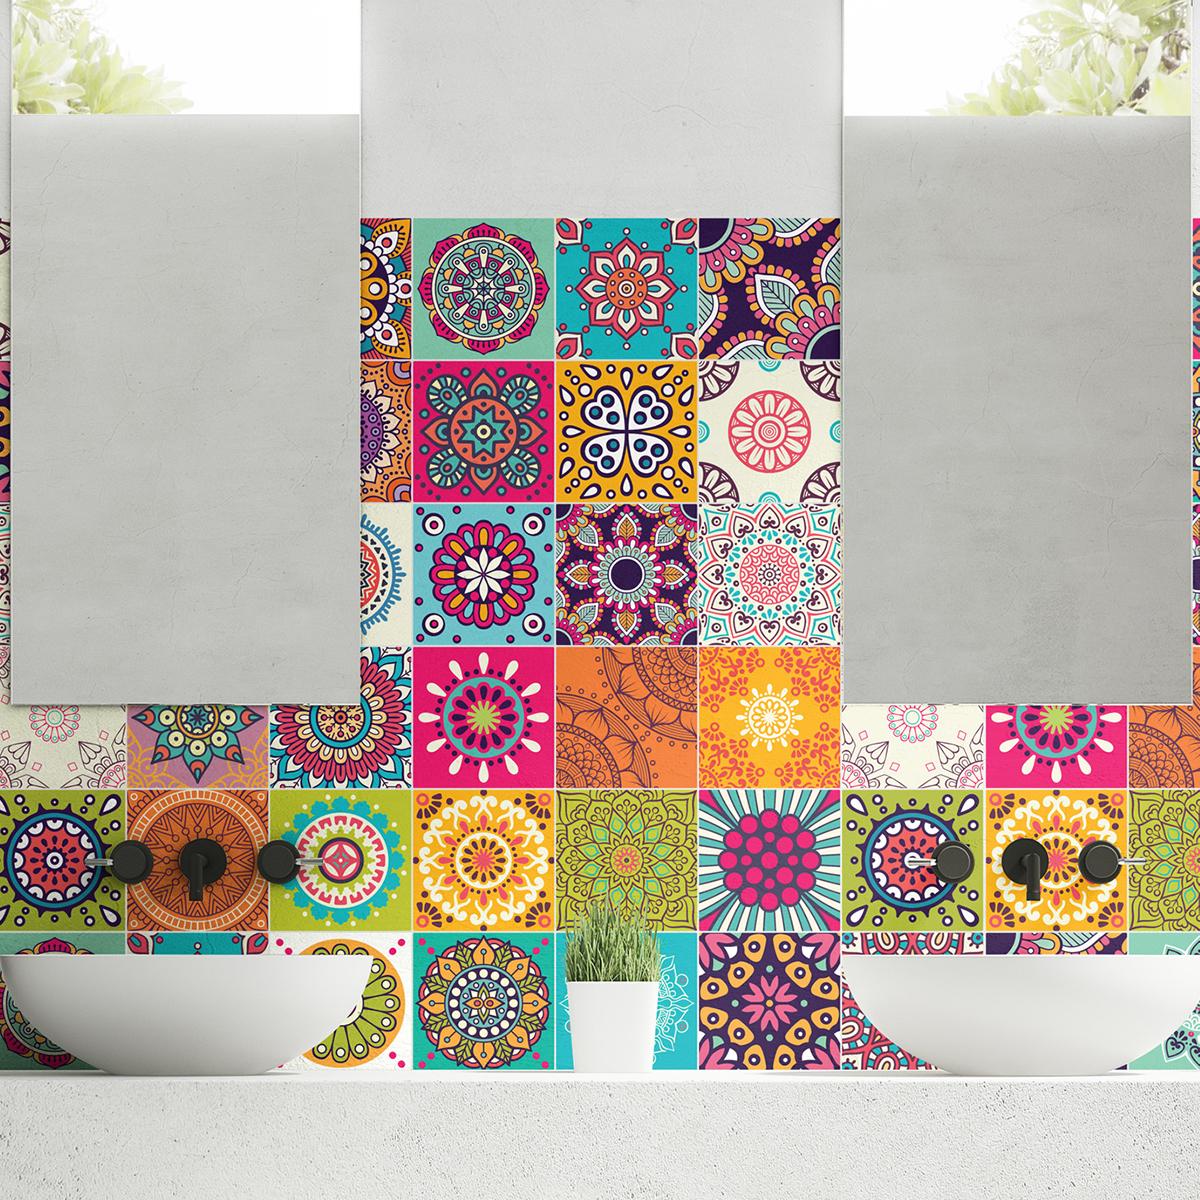 60 stickers carrelages azulejos roses multicolore art et design artistiques ambiance sticker. Black Bedroom Furniture Sets. Home Design Ideas